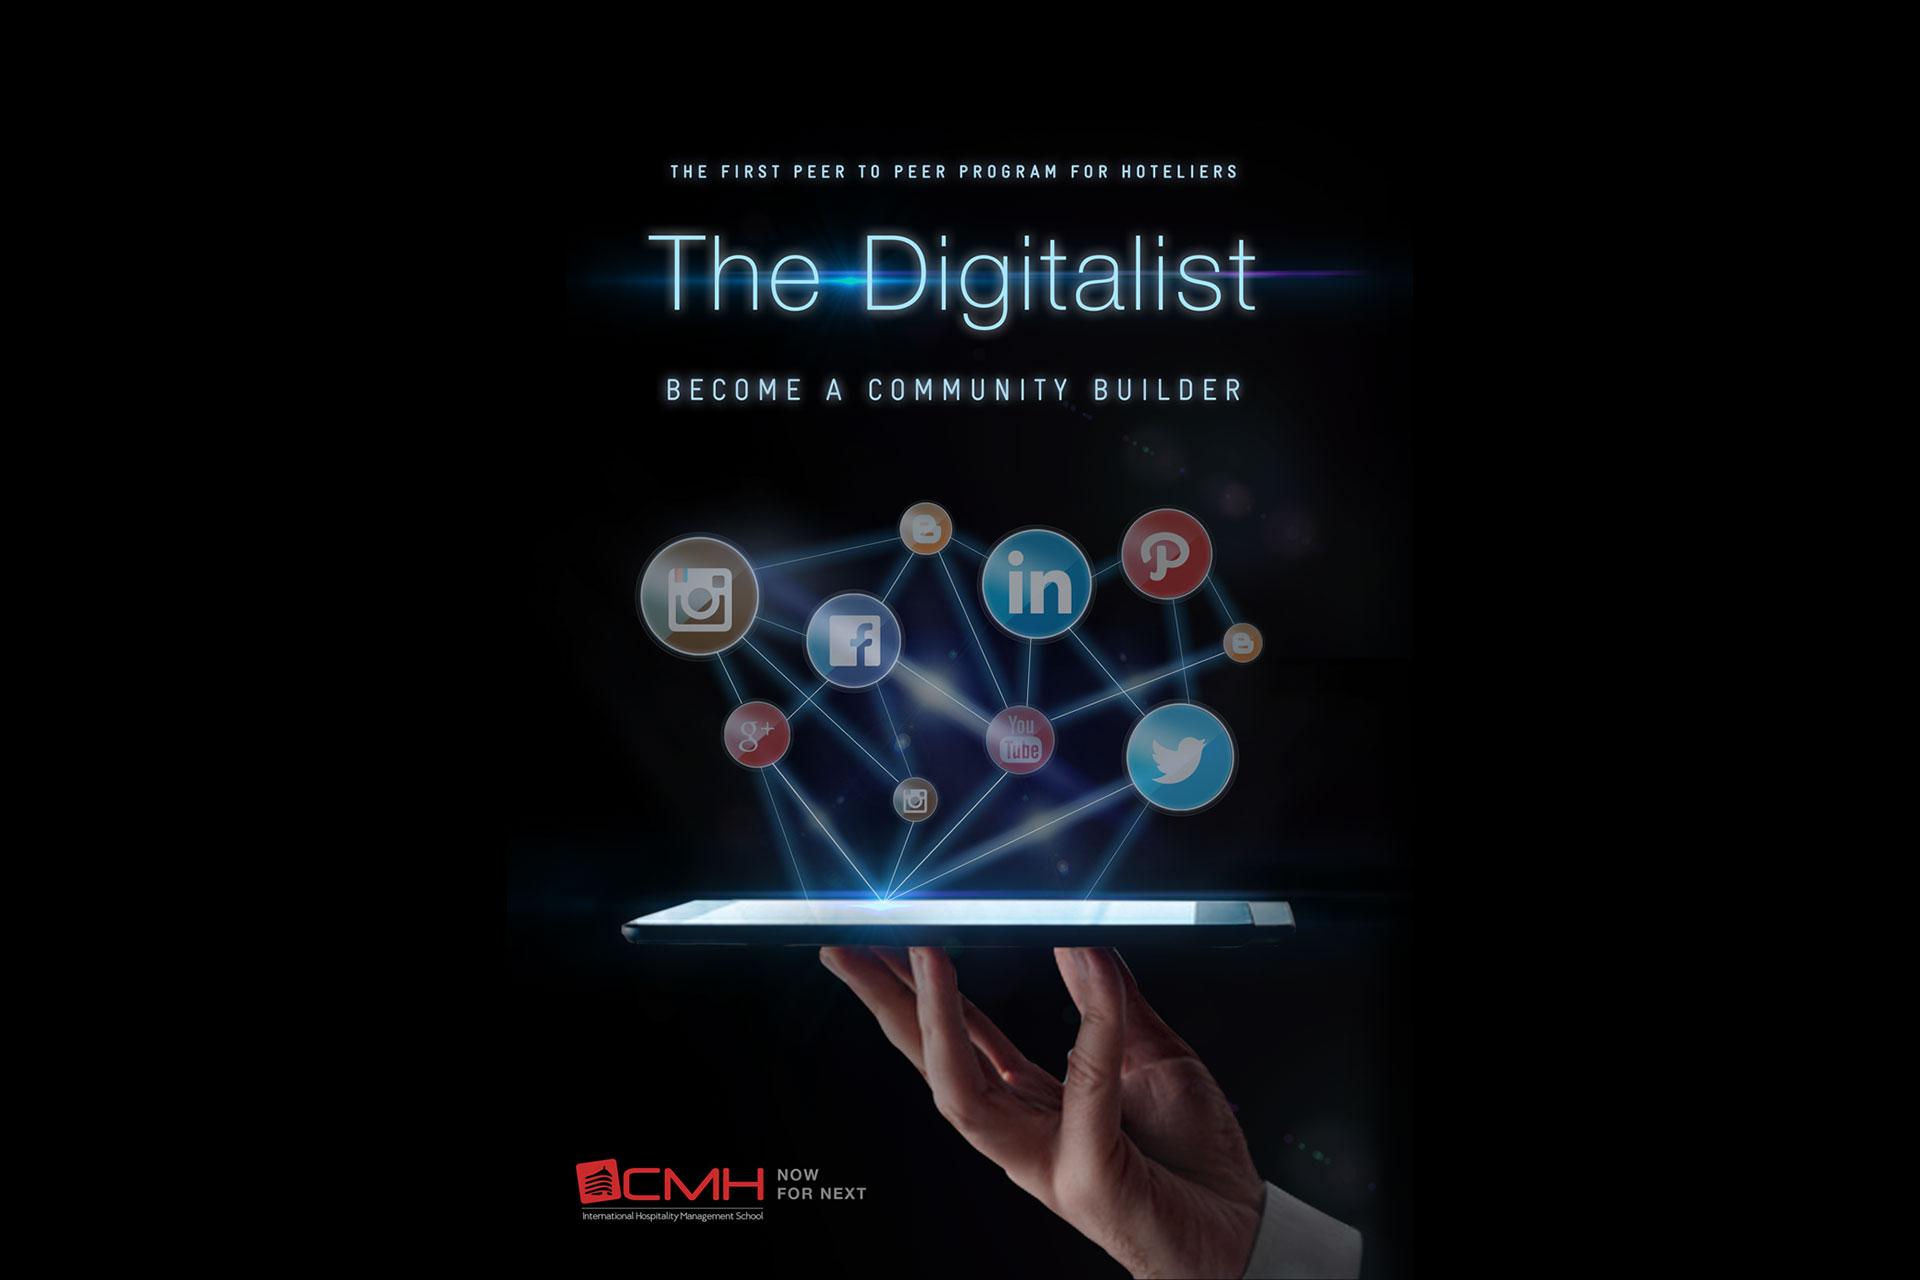 The Digitalist! The Peer to Peer program for tomorrow hoteliers